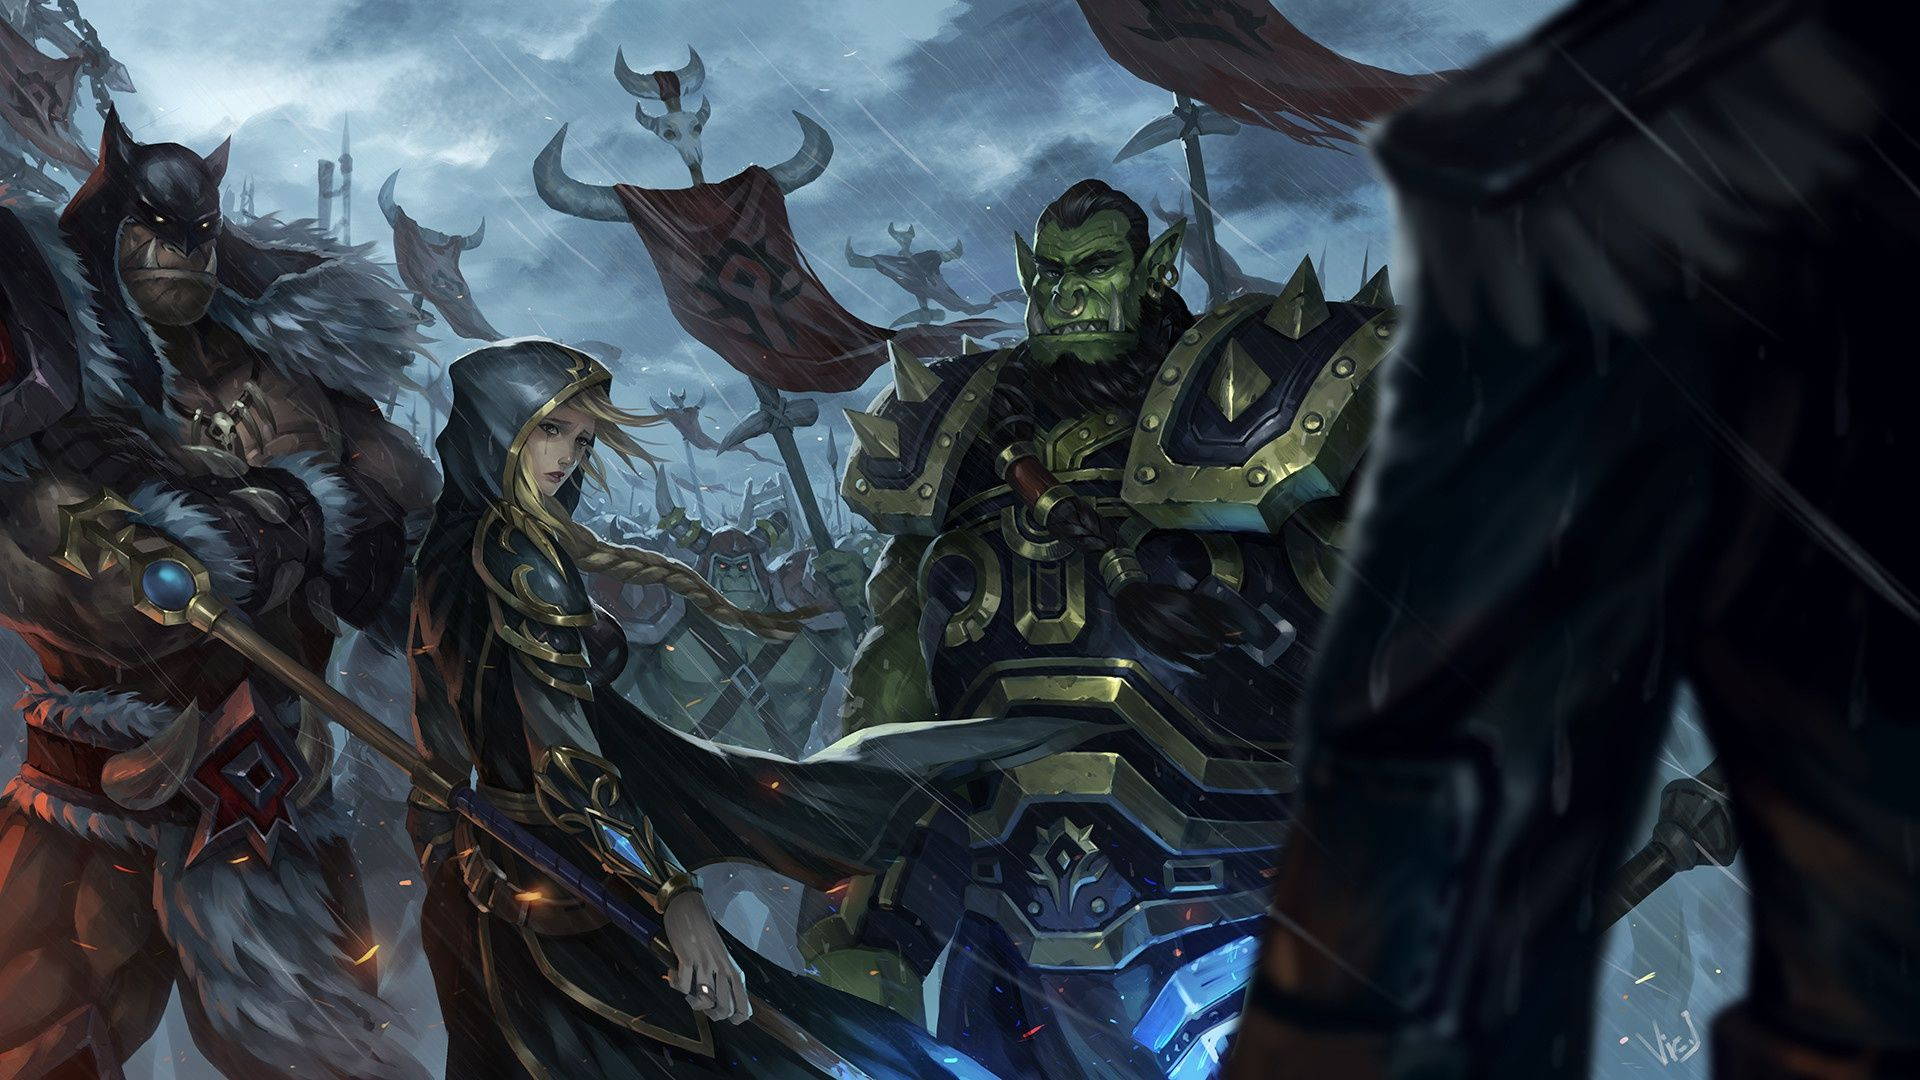 Videogame World Of Warcraft Knight Warrior Armor Anduin Lothar Hd